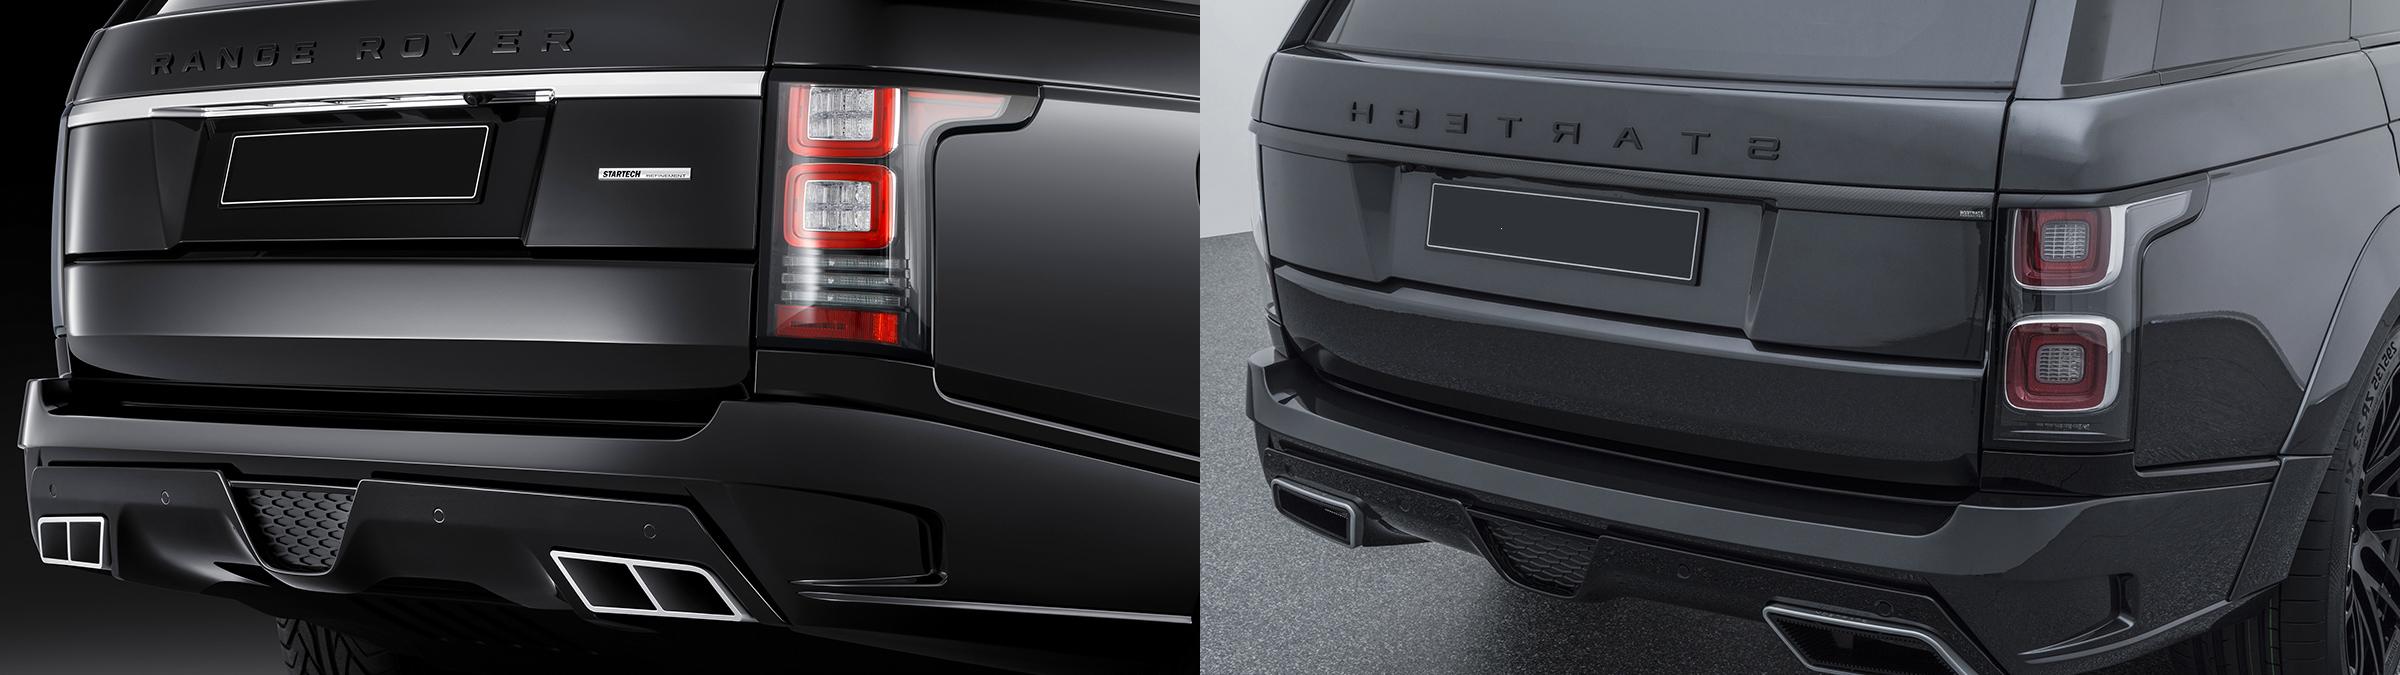 Сравнение фар Range Rover 2013-2018